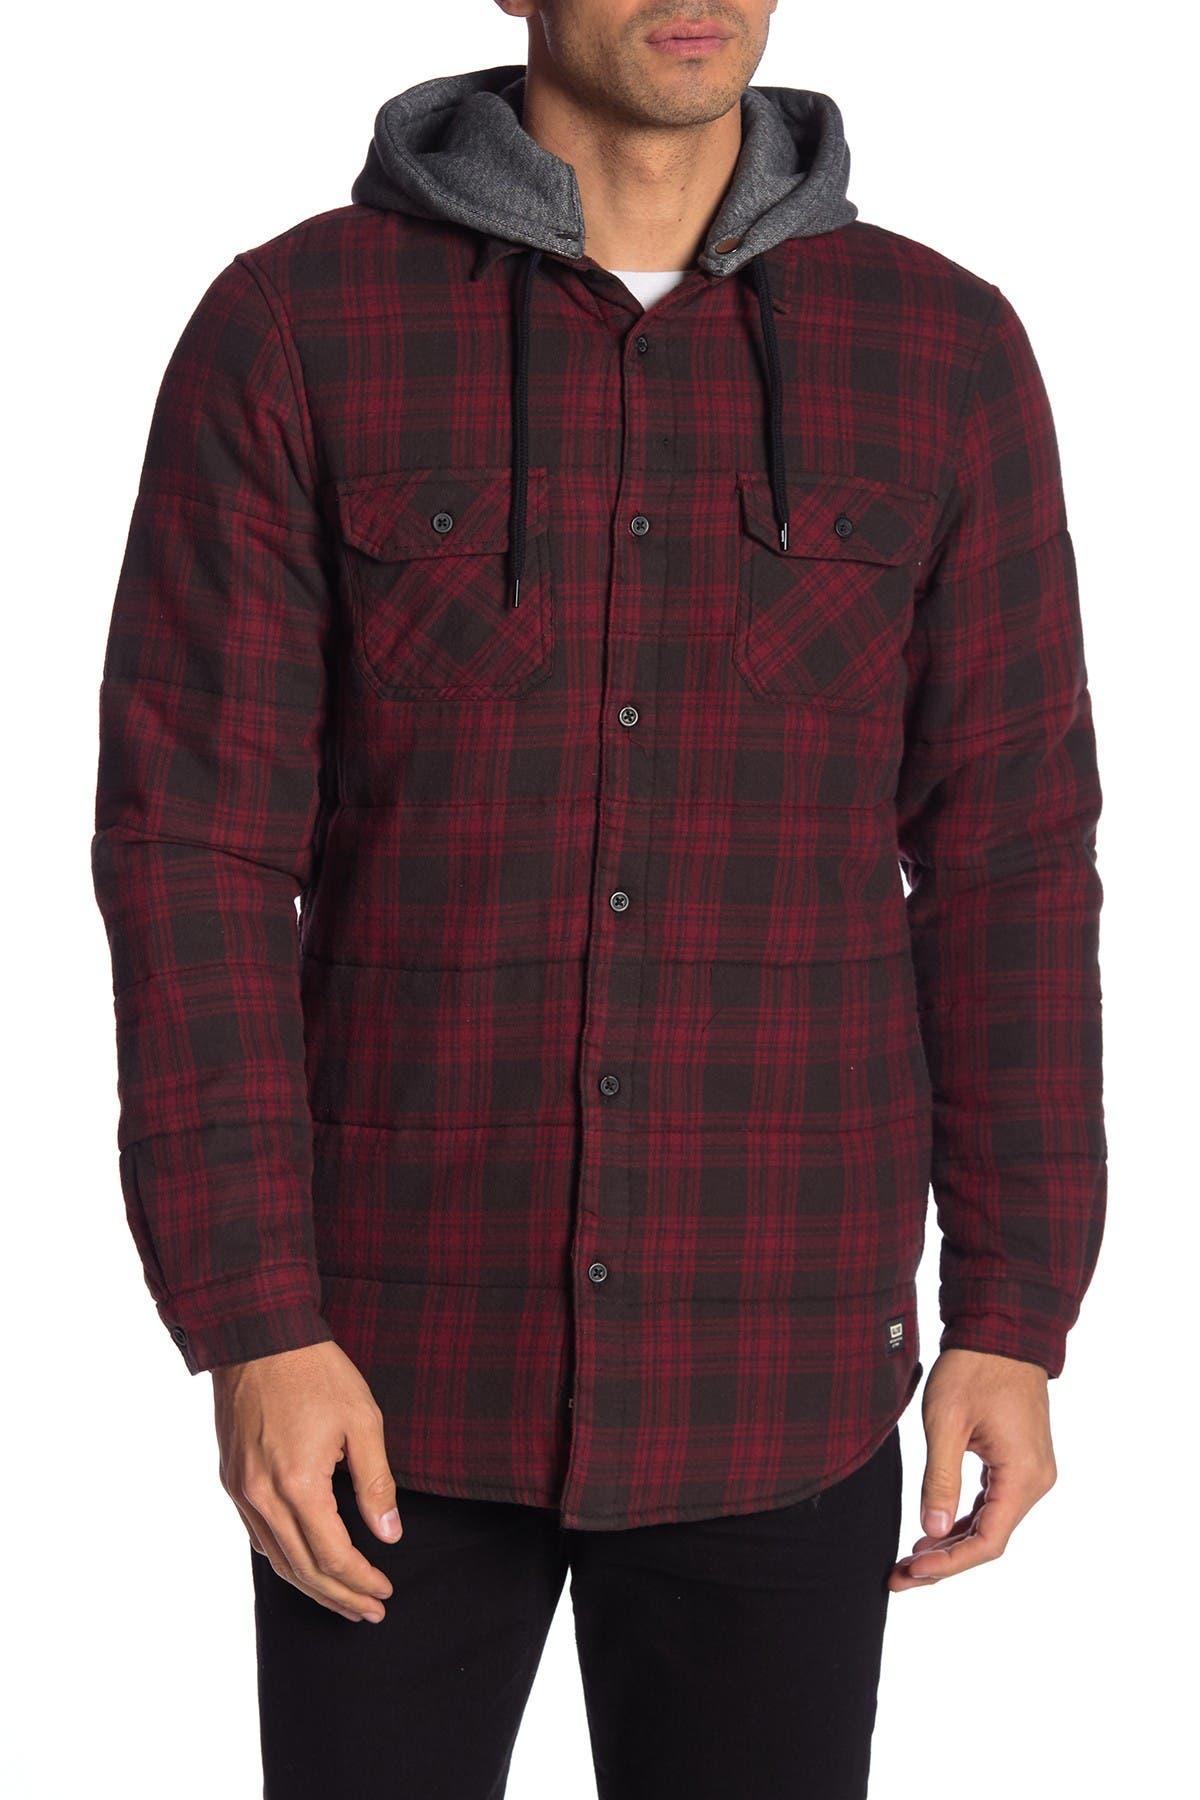 Globe Mens Alford III Long Sleeve Shirt